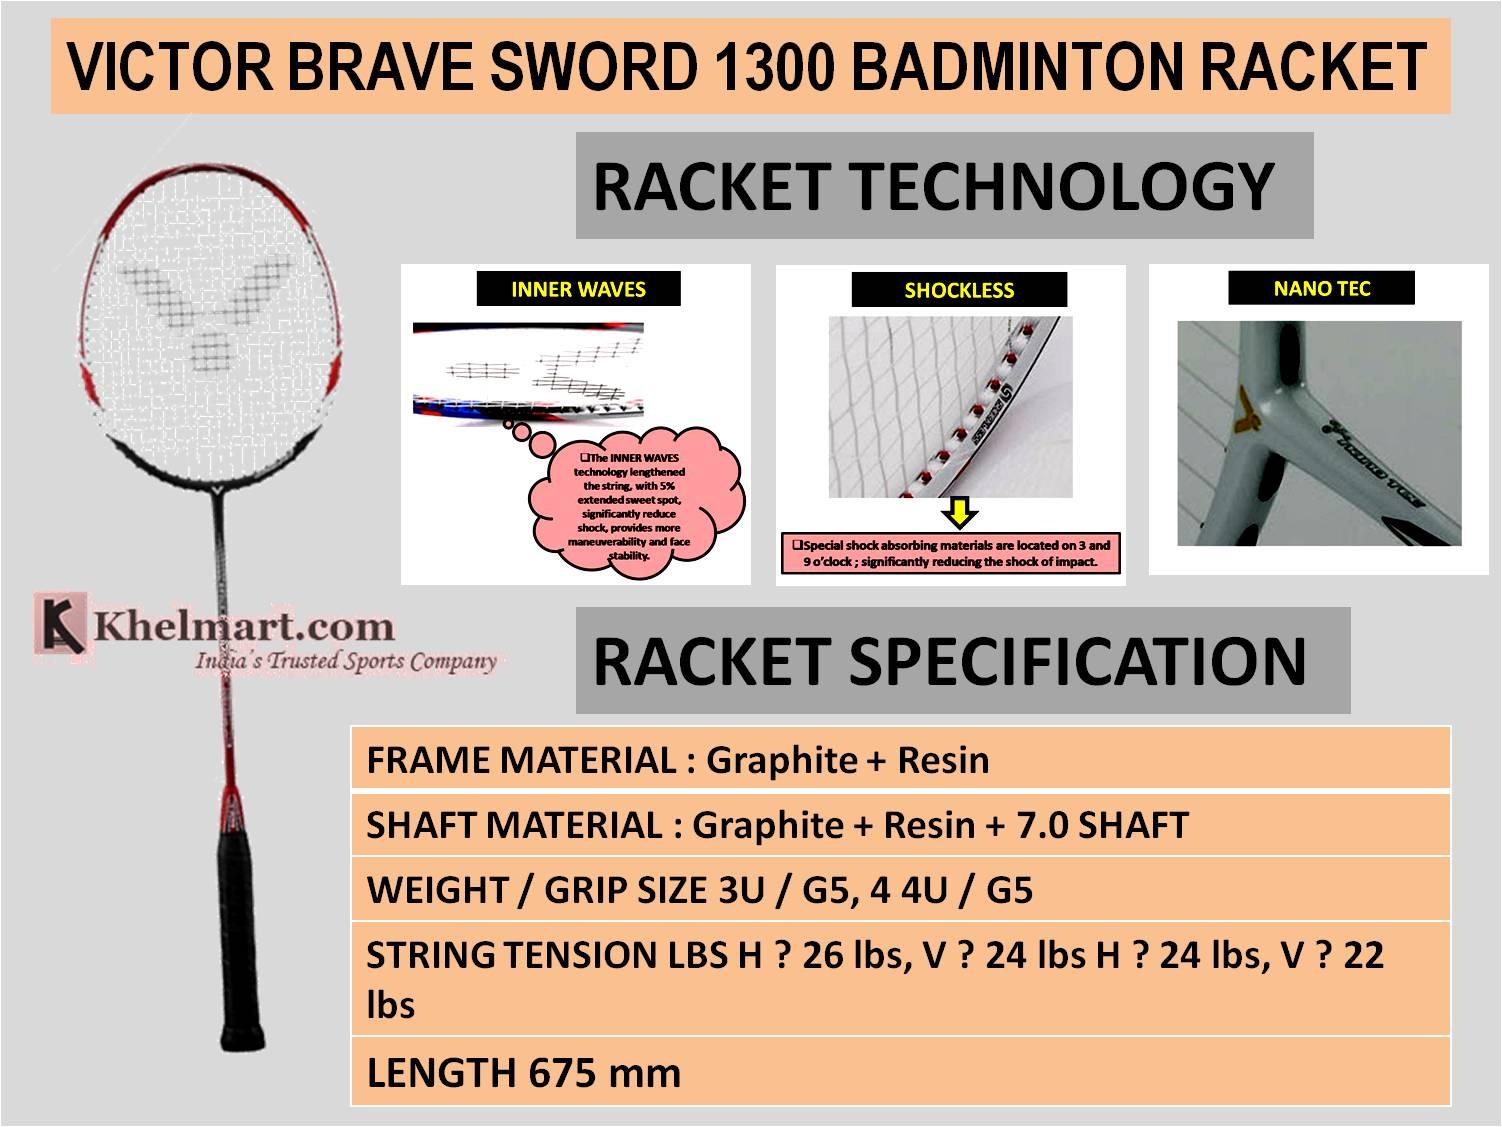 VICTOR_BRAVE_SWORD_1300_BADMINTON_RACKET